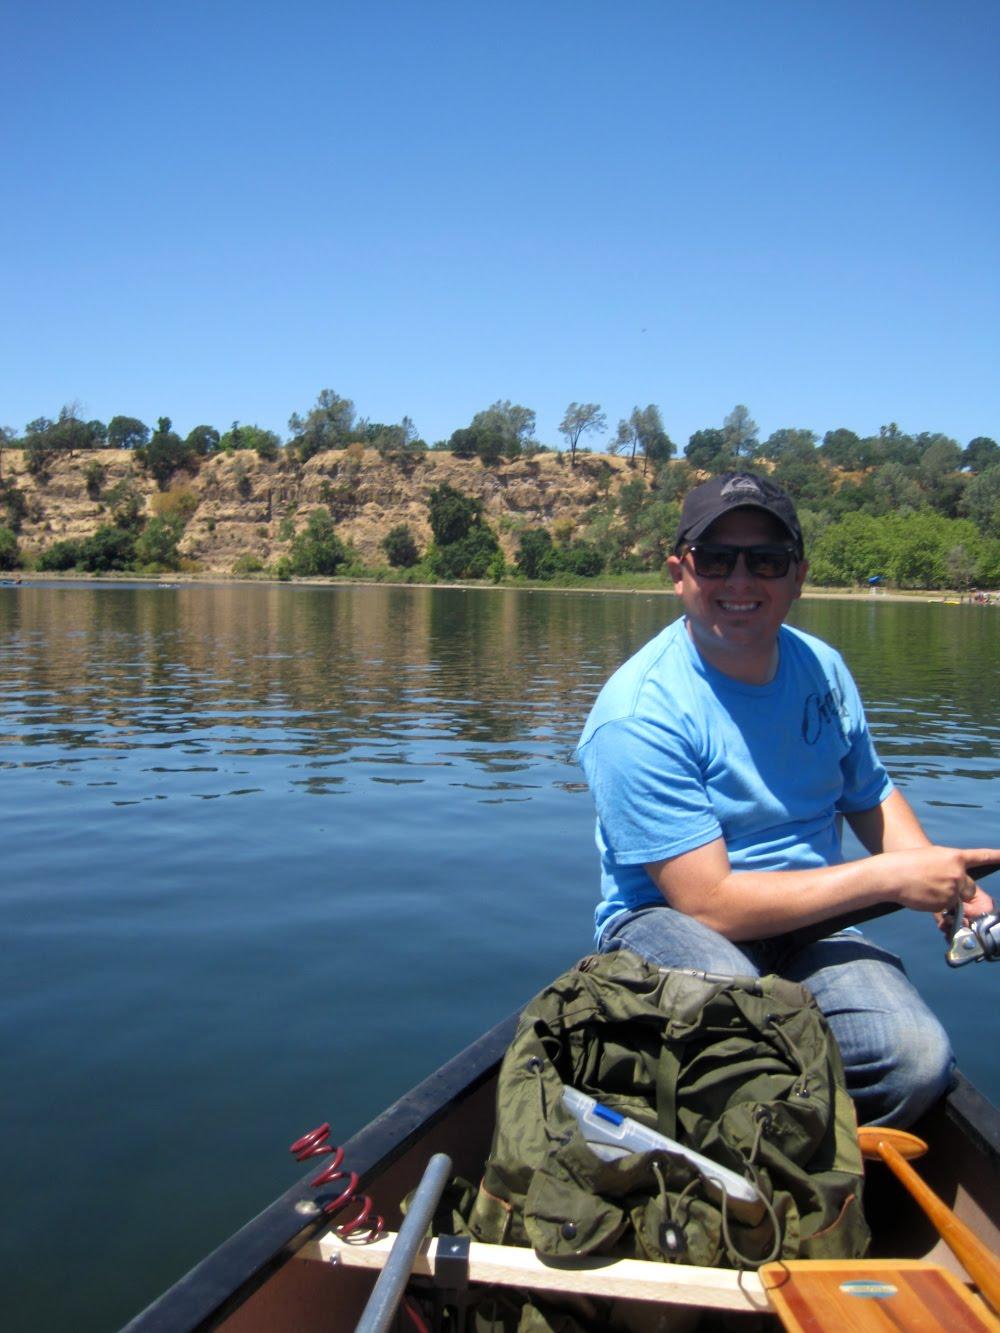 Sunny side up for Lake natoma fishing